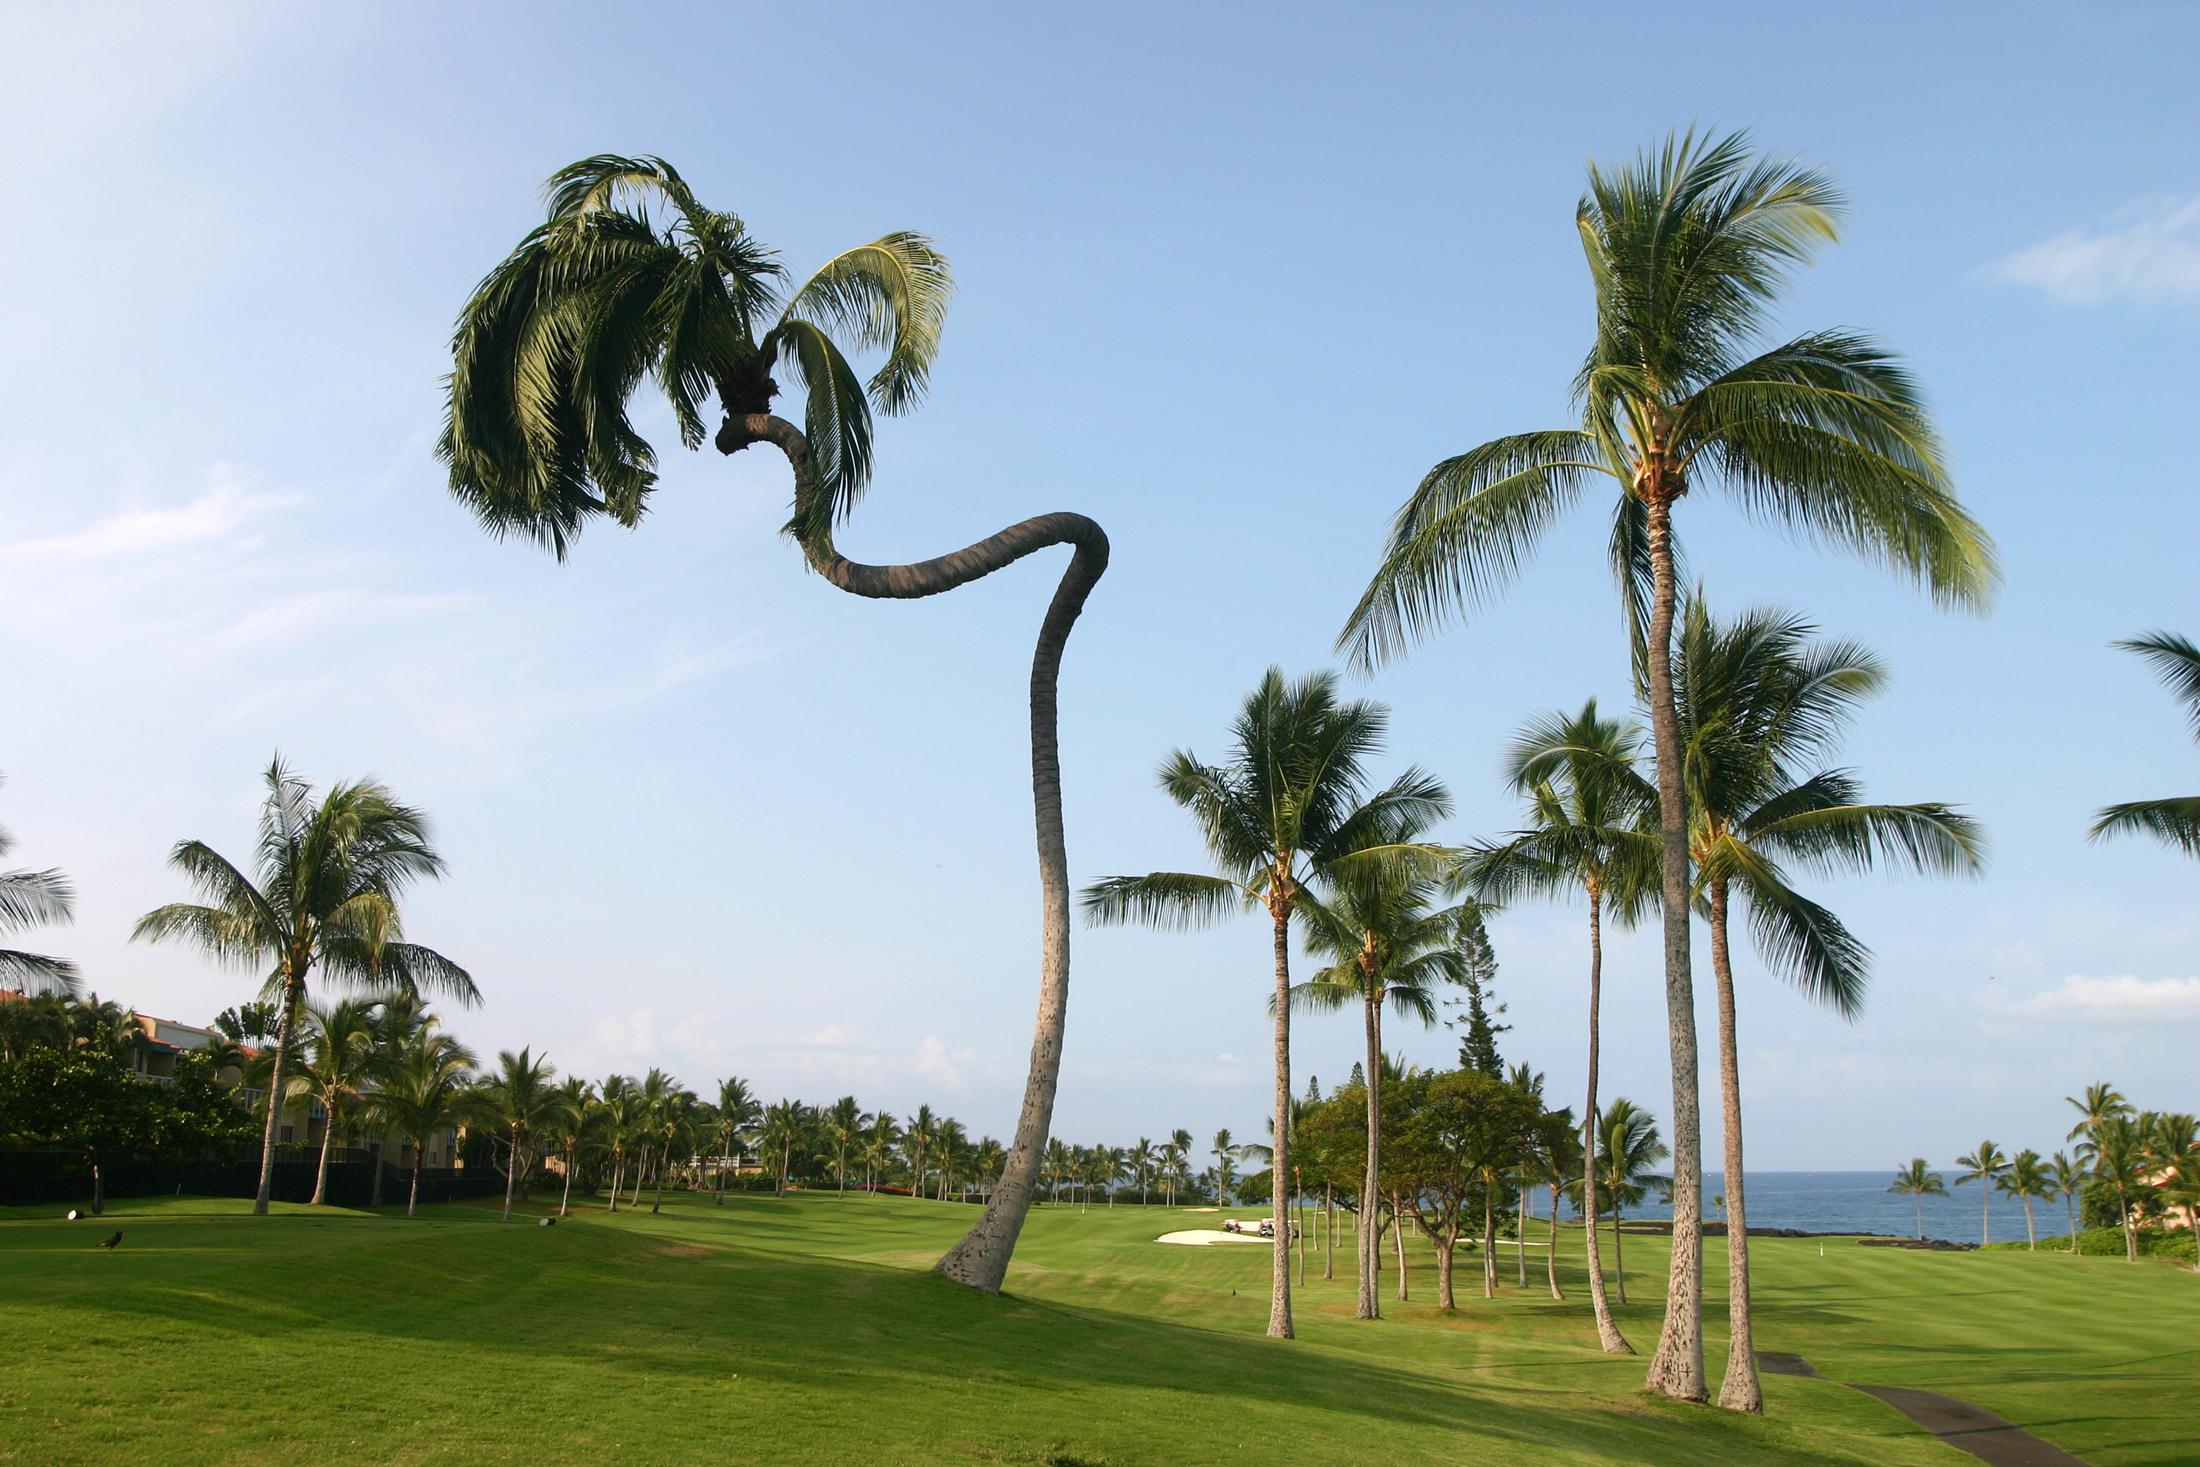 Http Commons Wikimedia Org Wiki File Unusual Arecaceae Big Island Of Hawaii Jpg